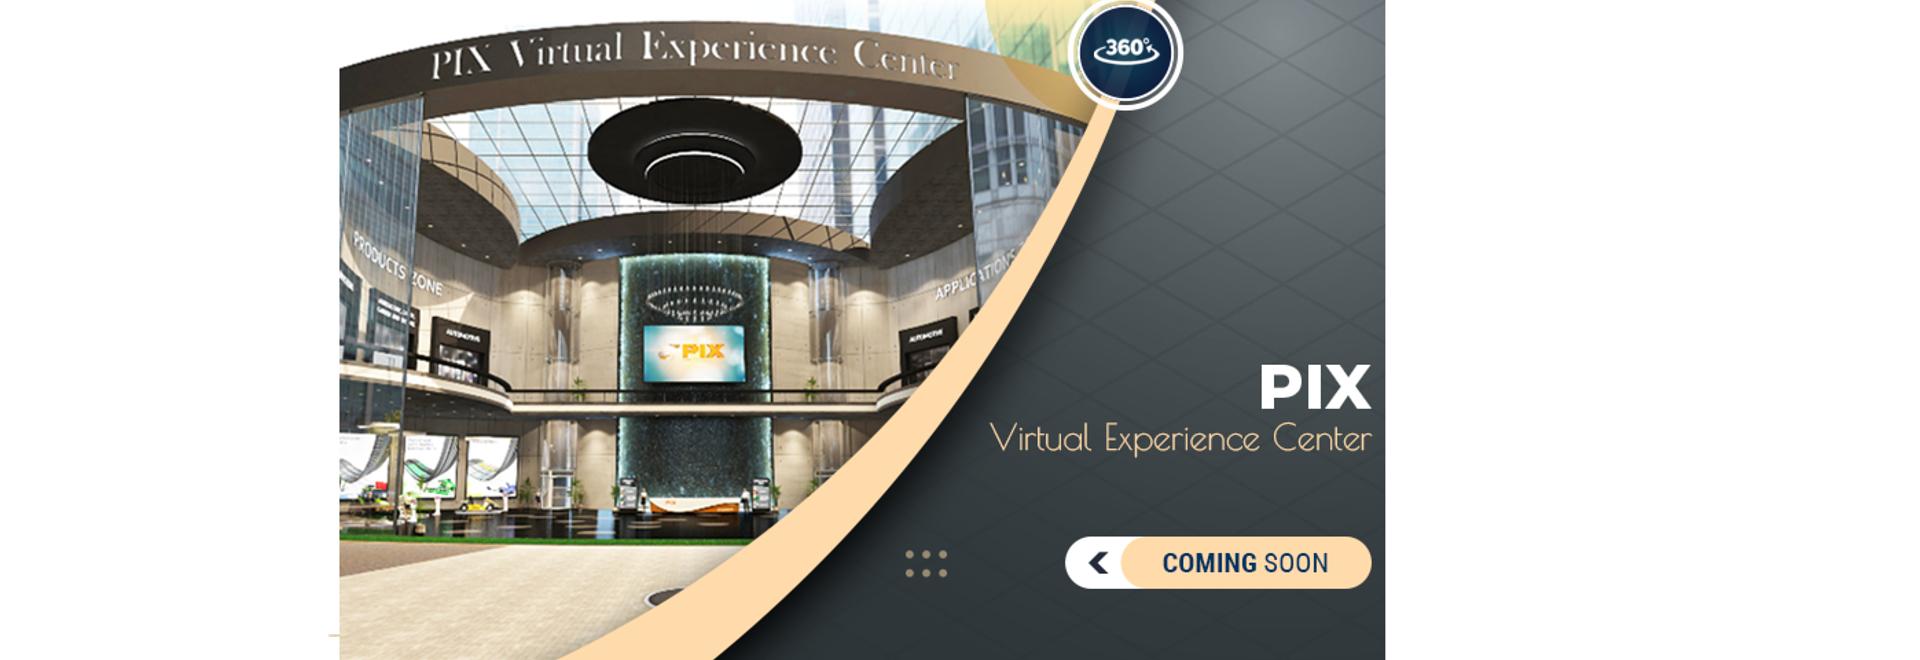 PIX Virtual Experience Center